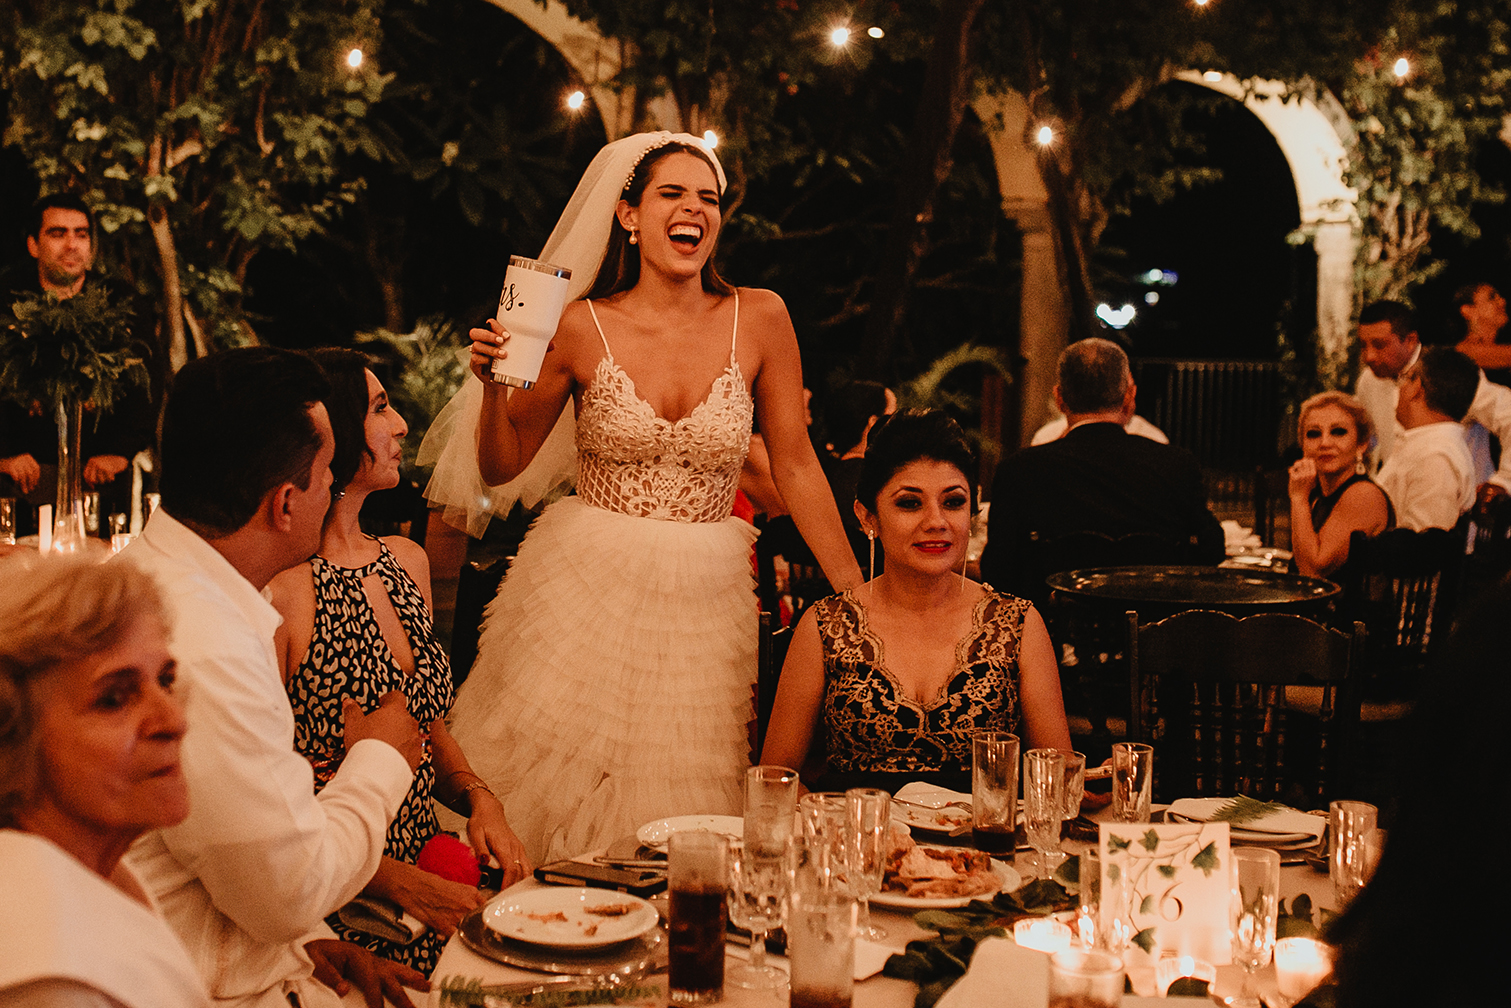 0962R&F__WeddingDestination_Weddingmerida_BodaMexico_FotografoDeBodas_FabrizioSimoneenFotografo.jpg